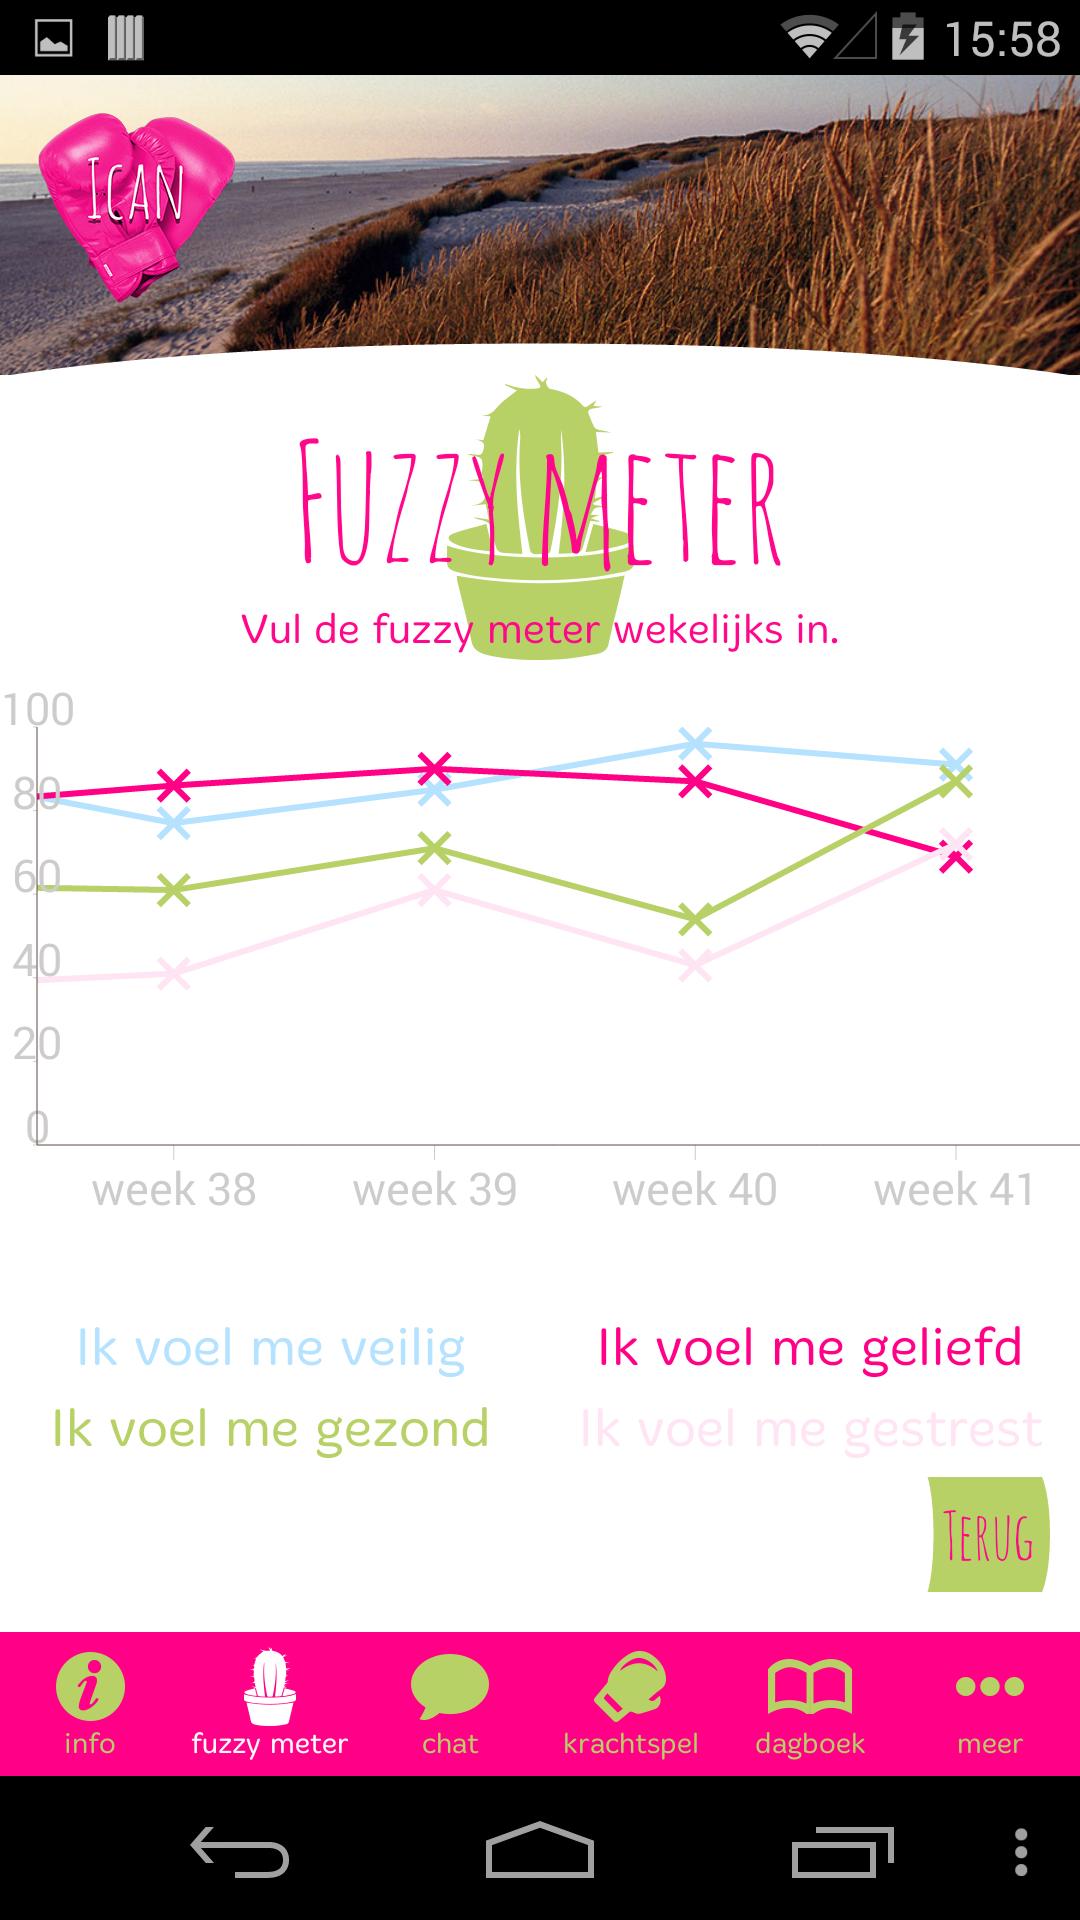 Fuzzy meter overzicht